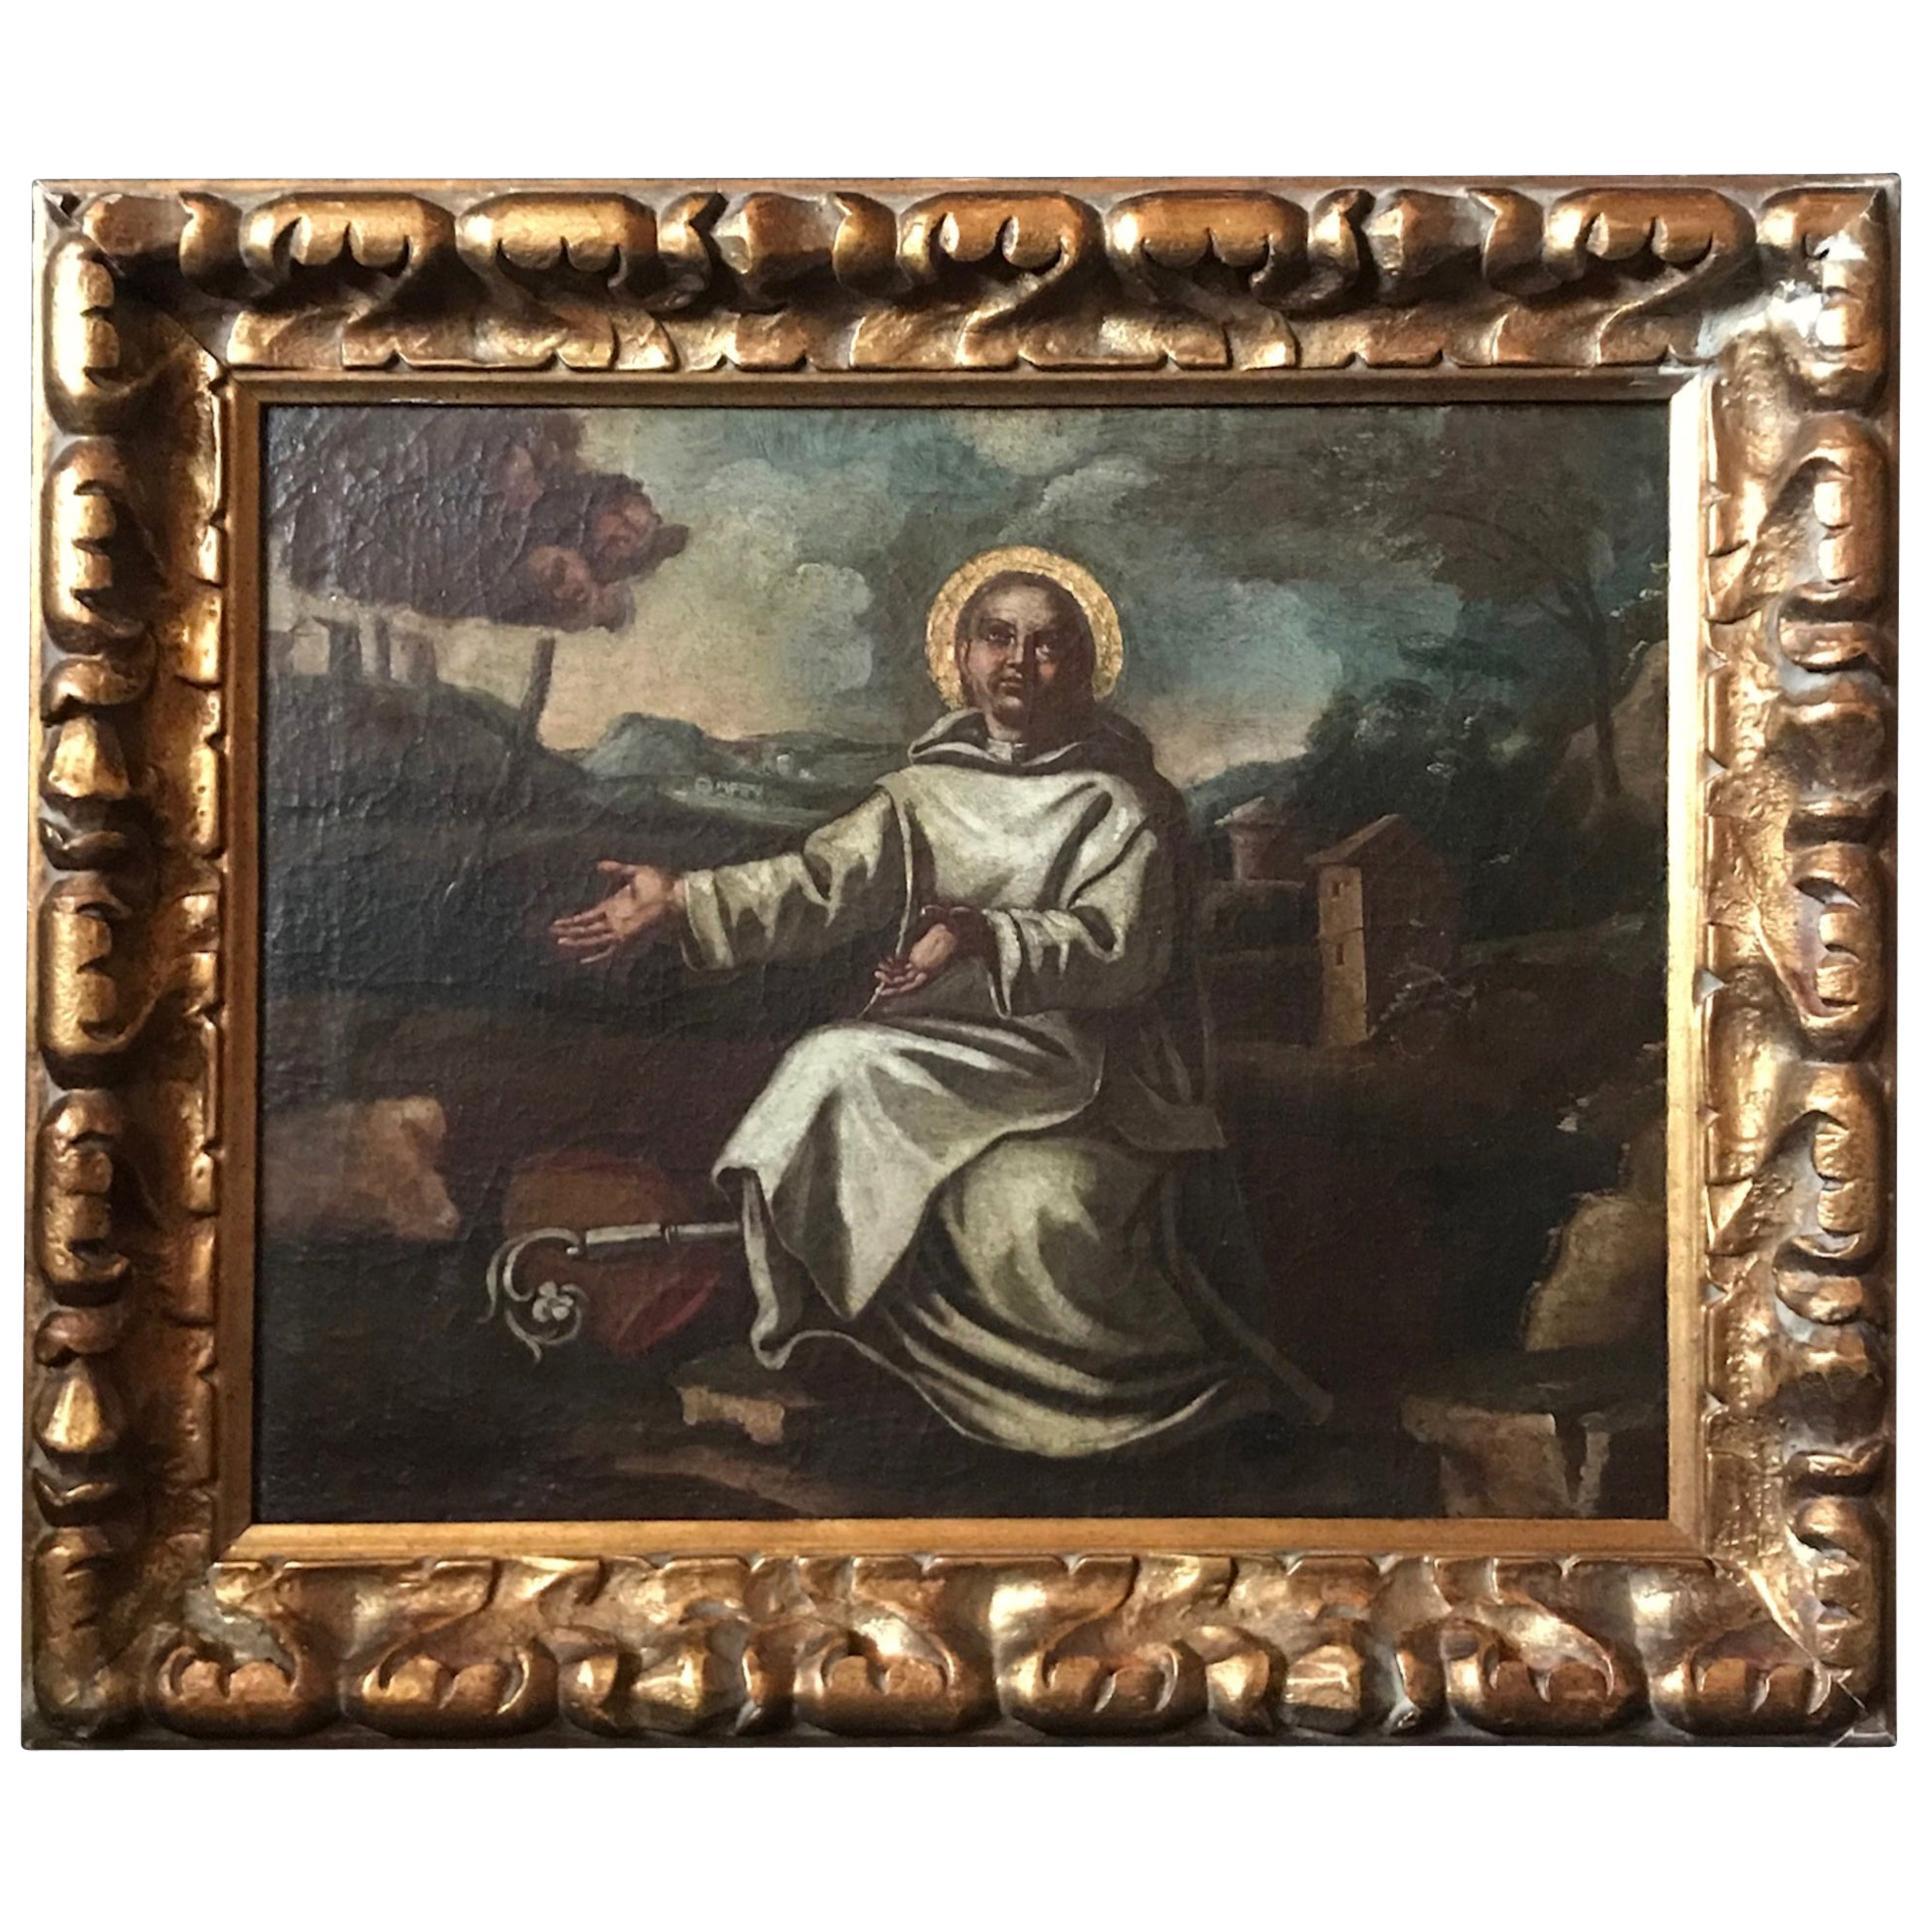 17th Century Old Master Oil Painting Saint Bernard of Clairvaux, Spanish School